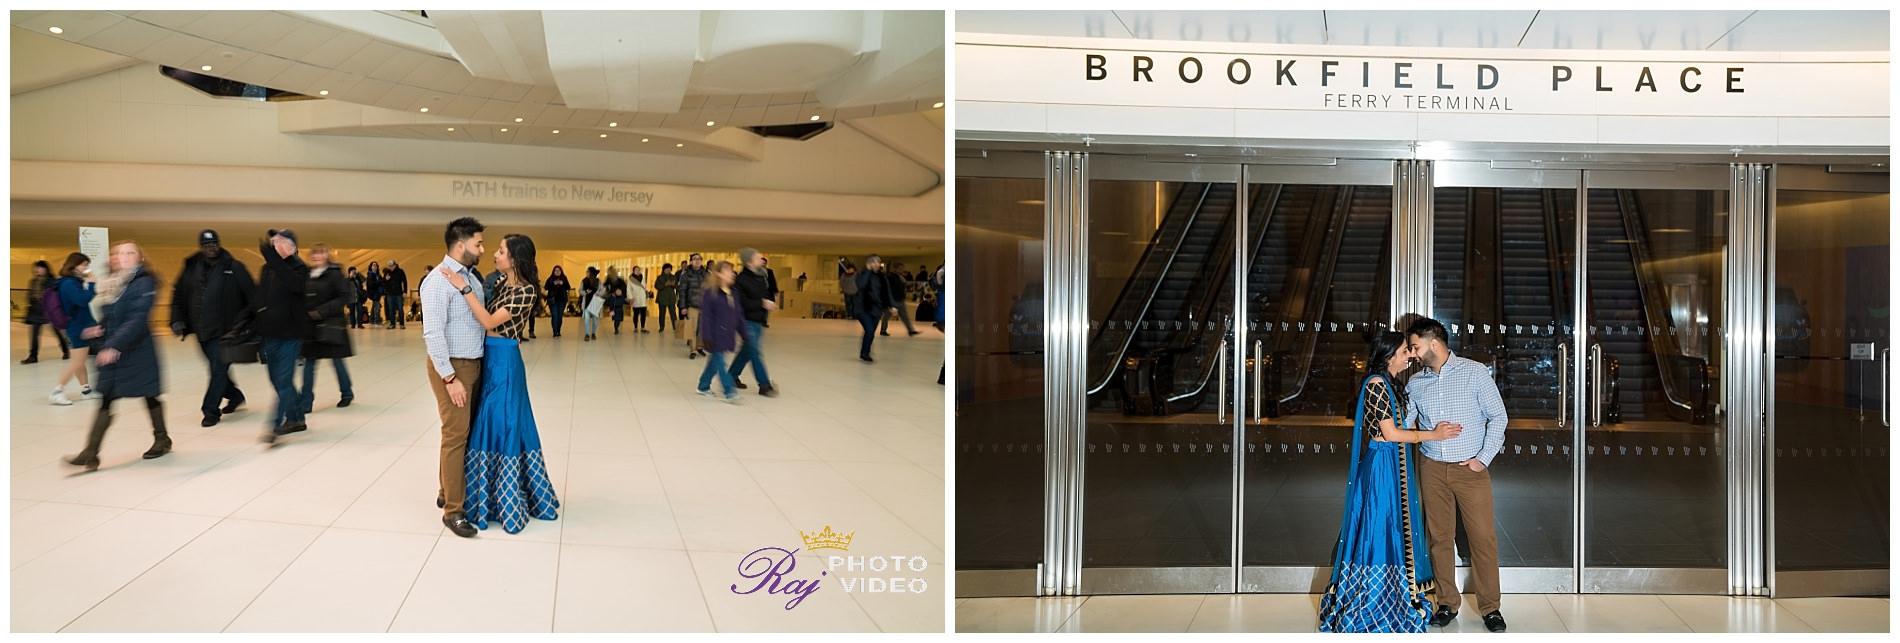 The-Oculus-Brookfield-Place-Downtown-Manhattan-Engagement-Shoot-Nidhi-Rudra-00006.jpg